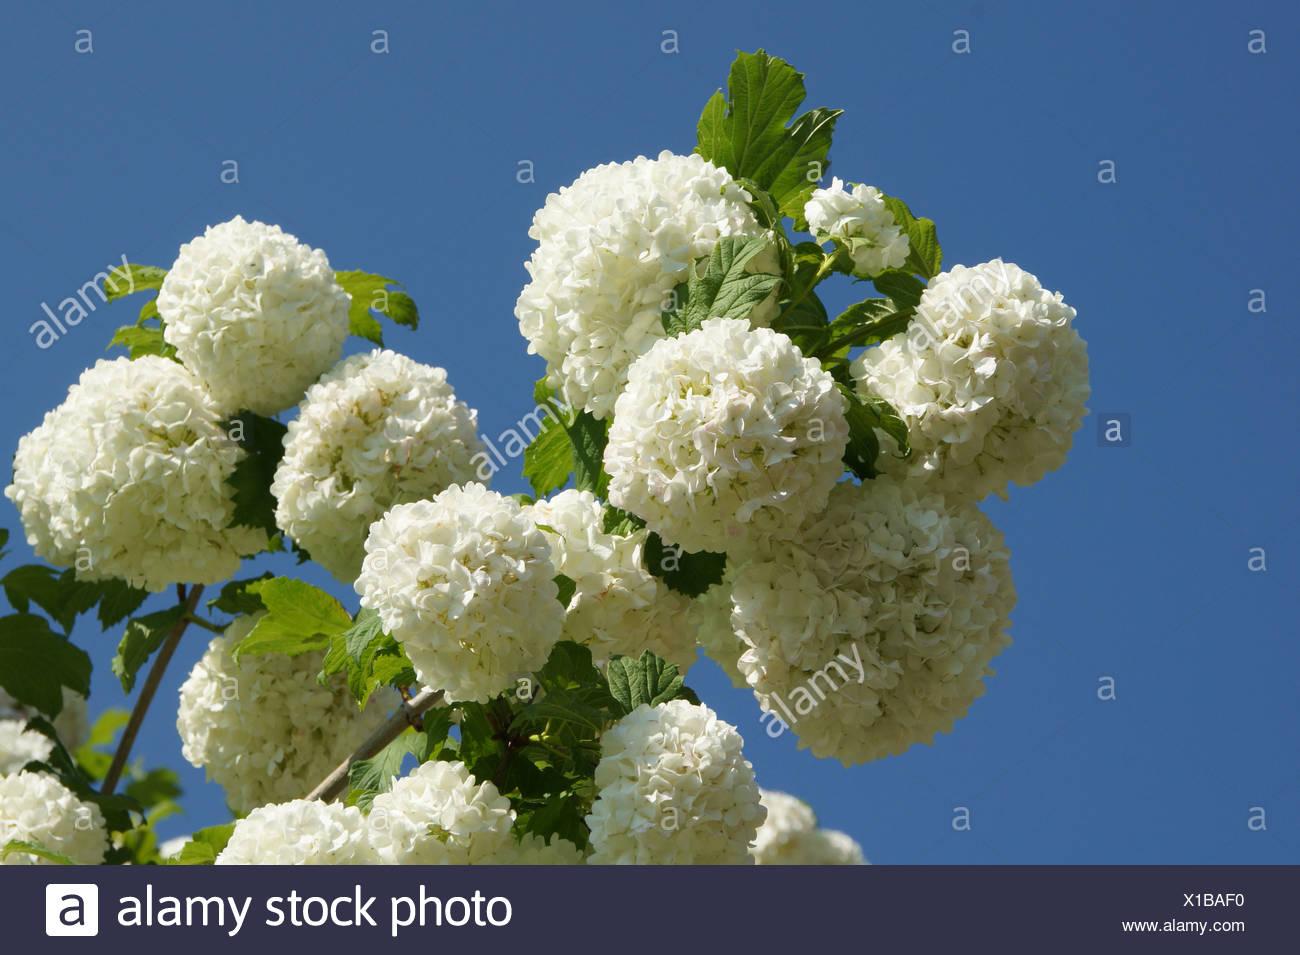 Snowball-shrub - Stock Image